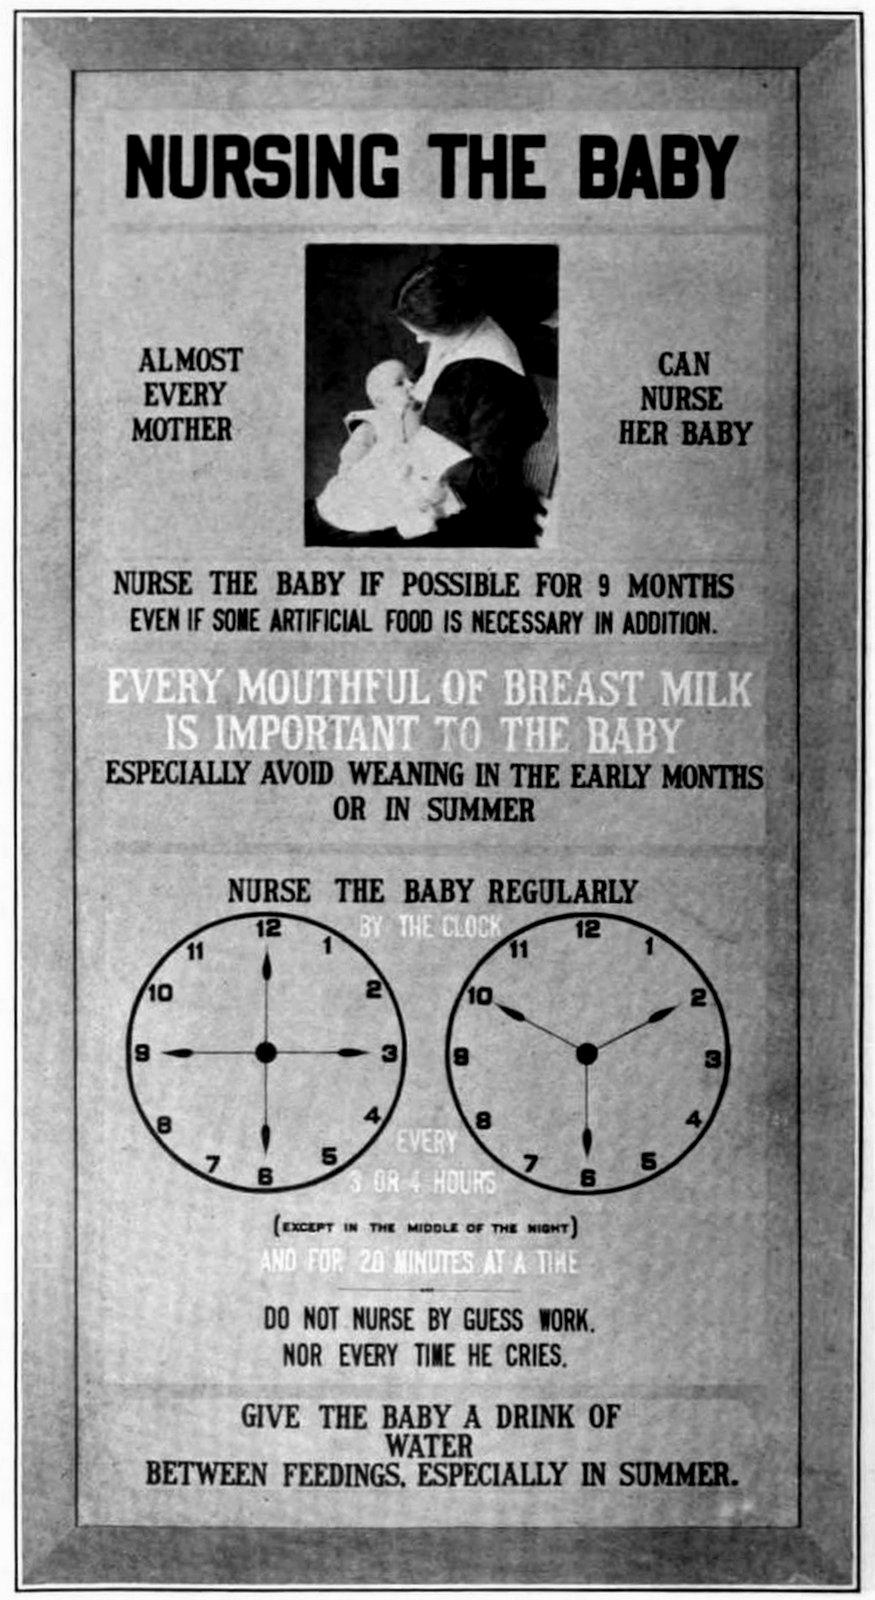 Vintage breastfeeding tips - Infant Mortality 1915 (5)